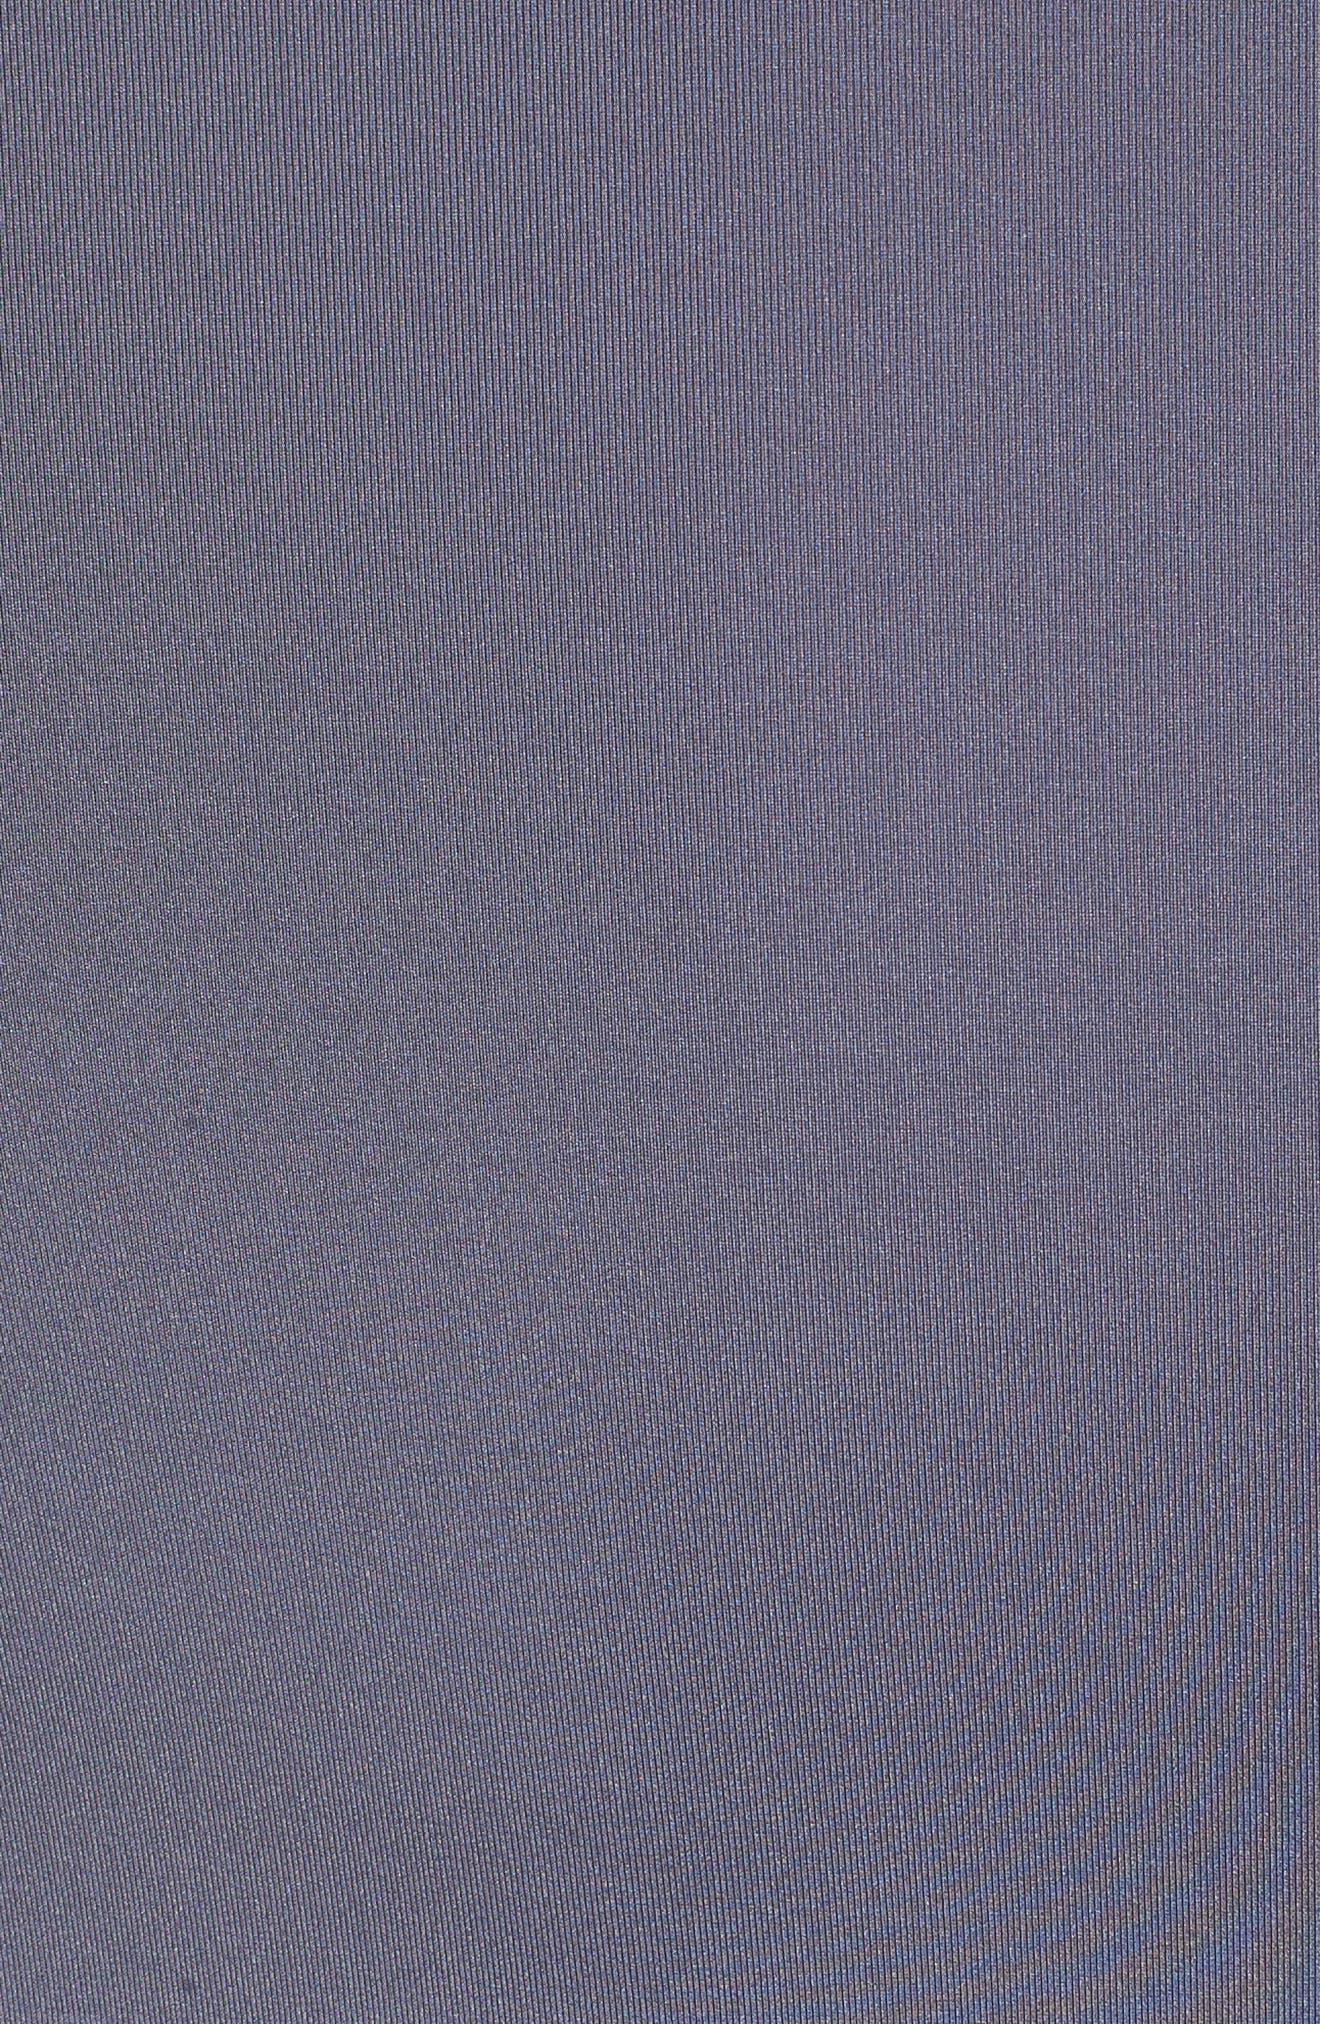 Dry Dynamic Slim Fit Polo,                             Alternate thumbnail 5, color,                             Light Carbon/ Black